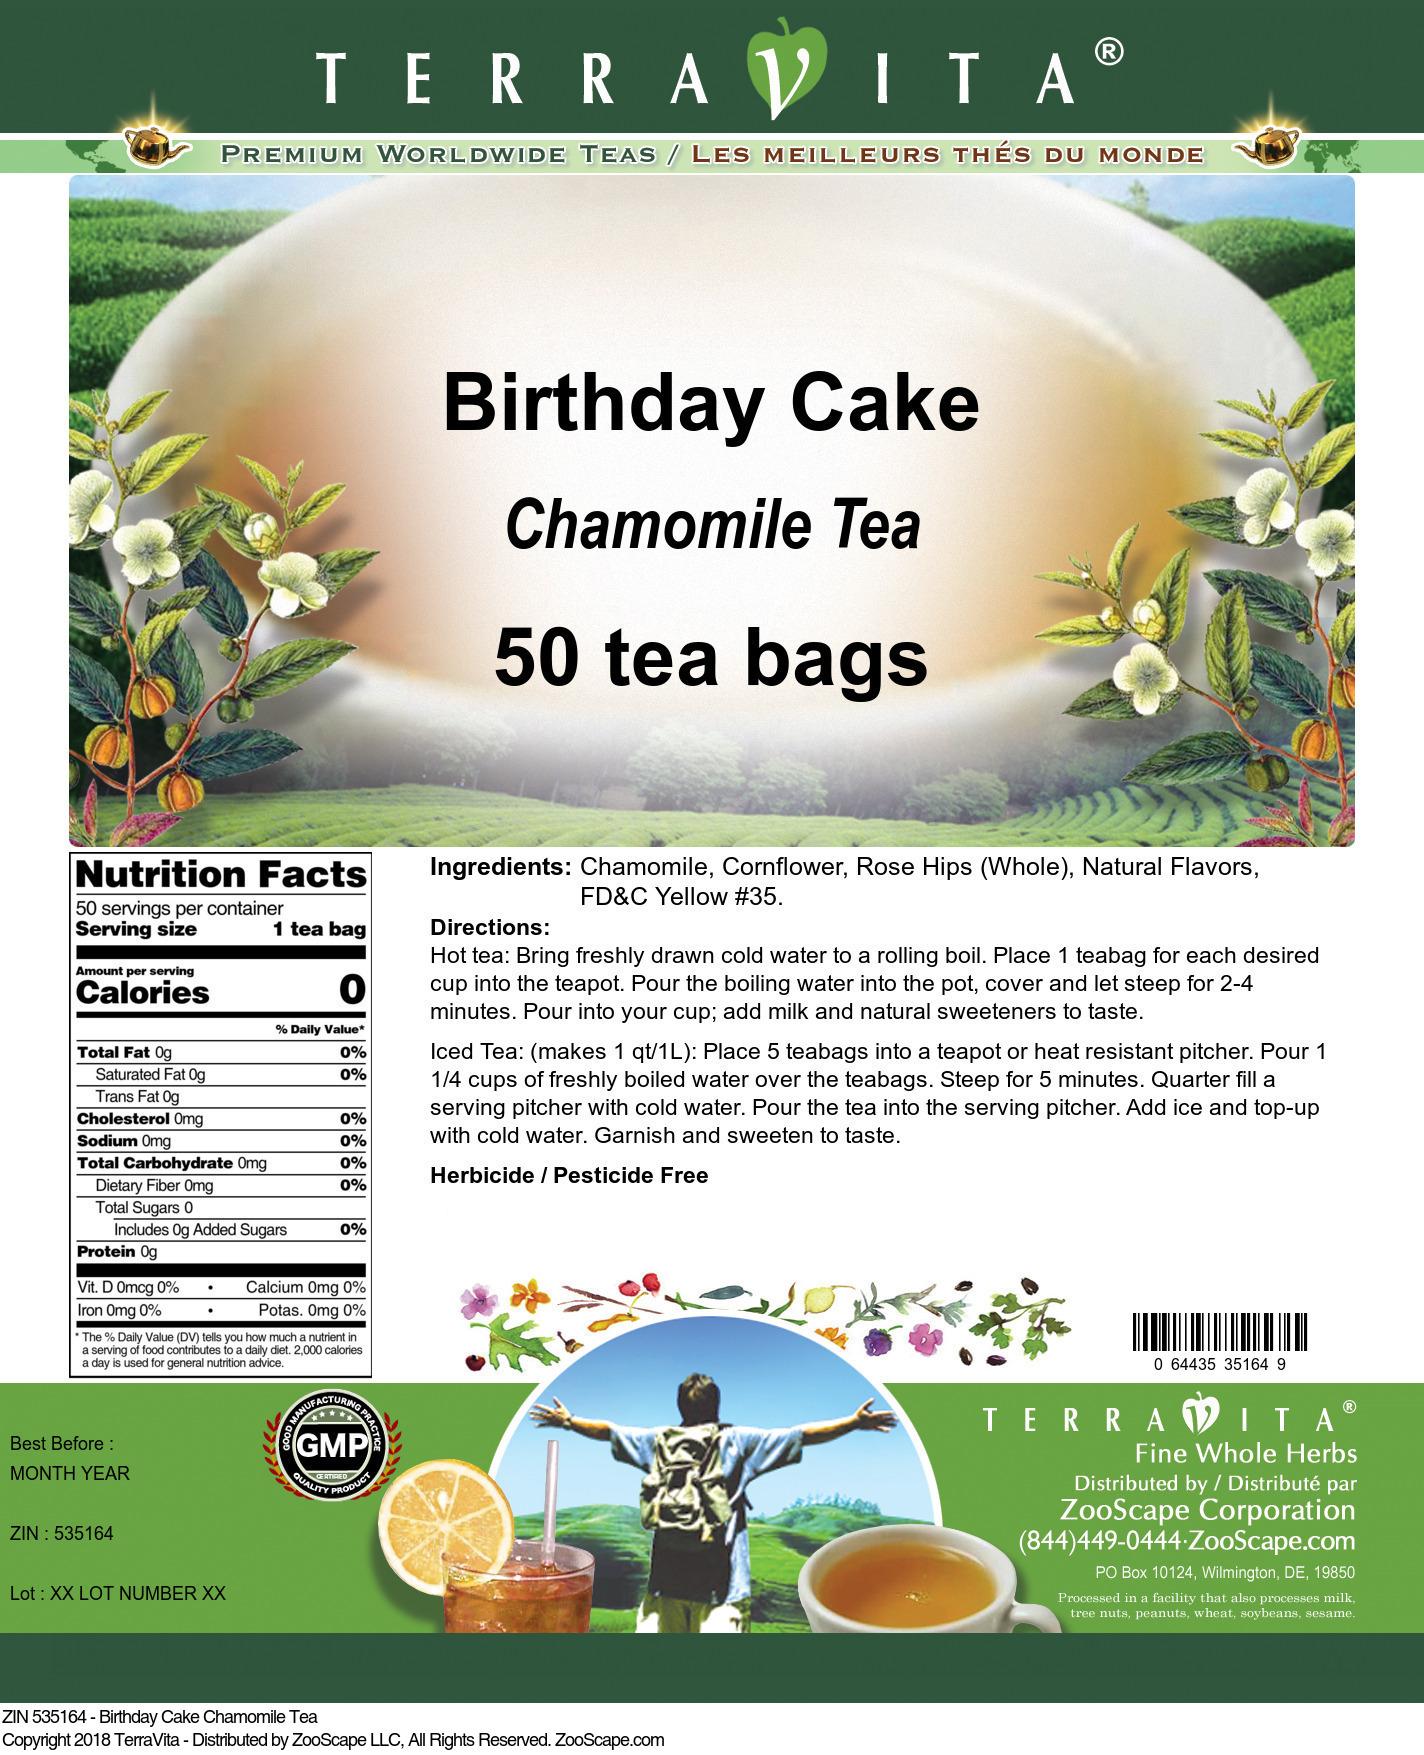 Birthday Cake Chamomile Tea